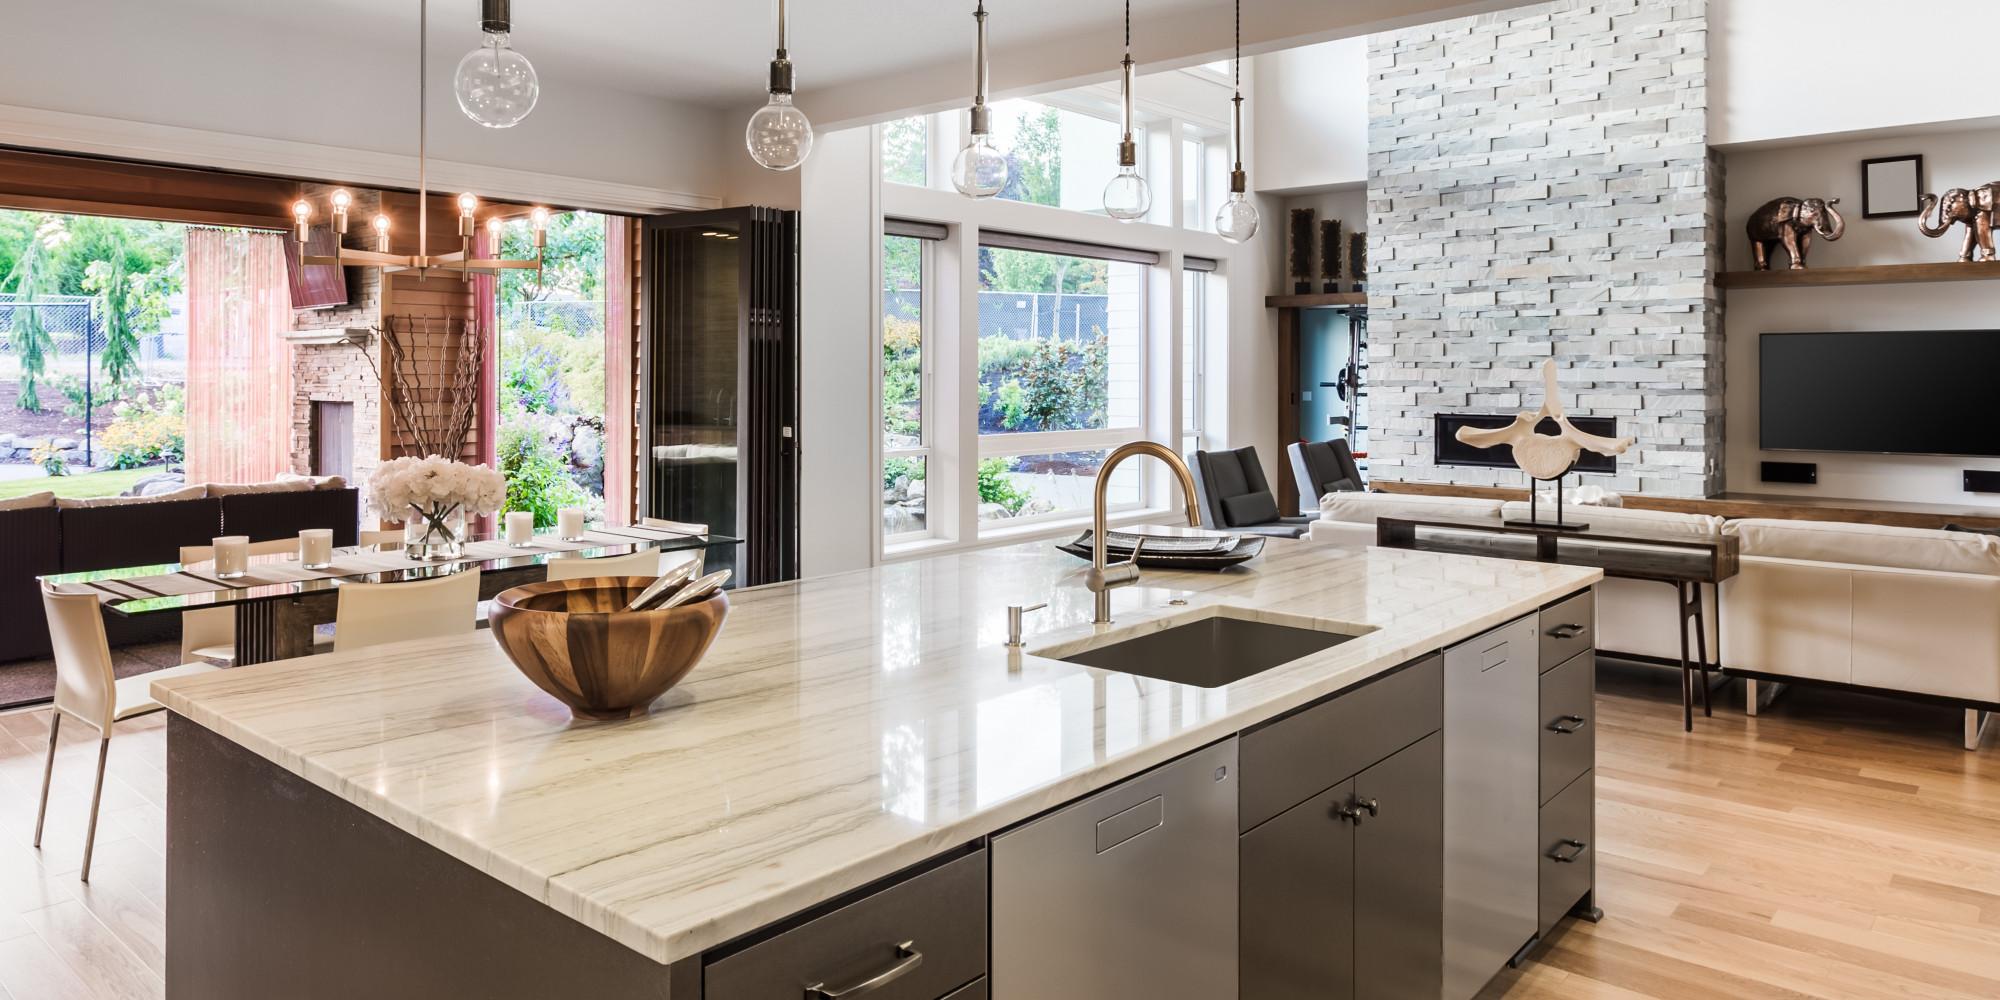 Kitchen Upgrades 7 Kitchen Upgrades Under 5k That Boost Home Values Huffpost